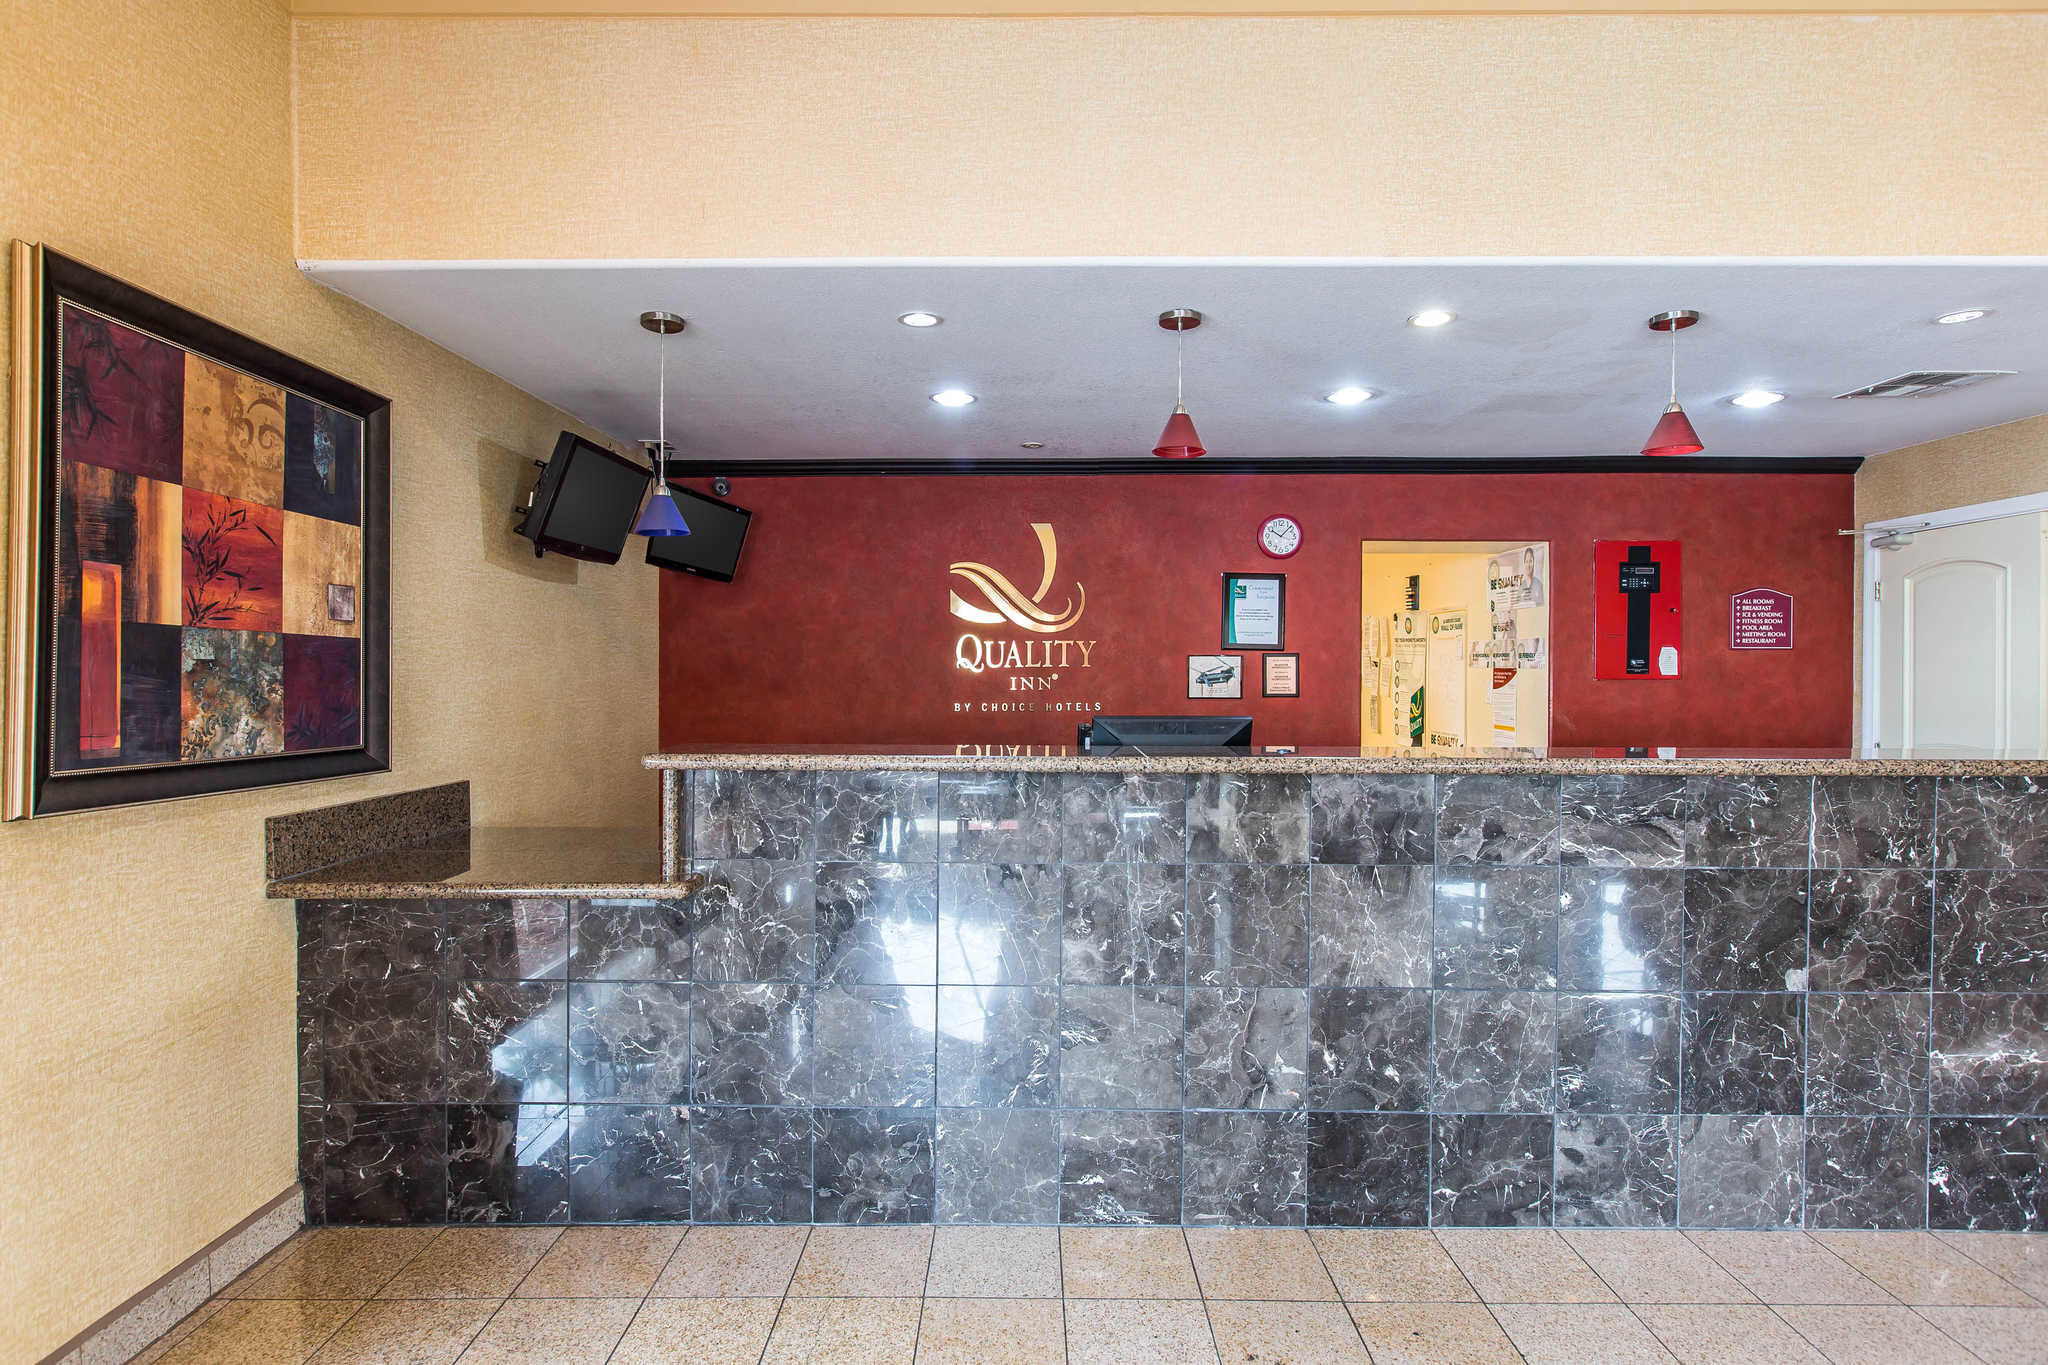 Quality Inn El Centro I-8 image 4